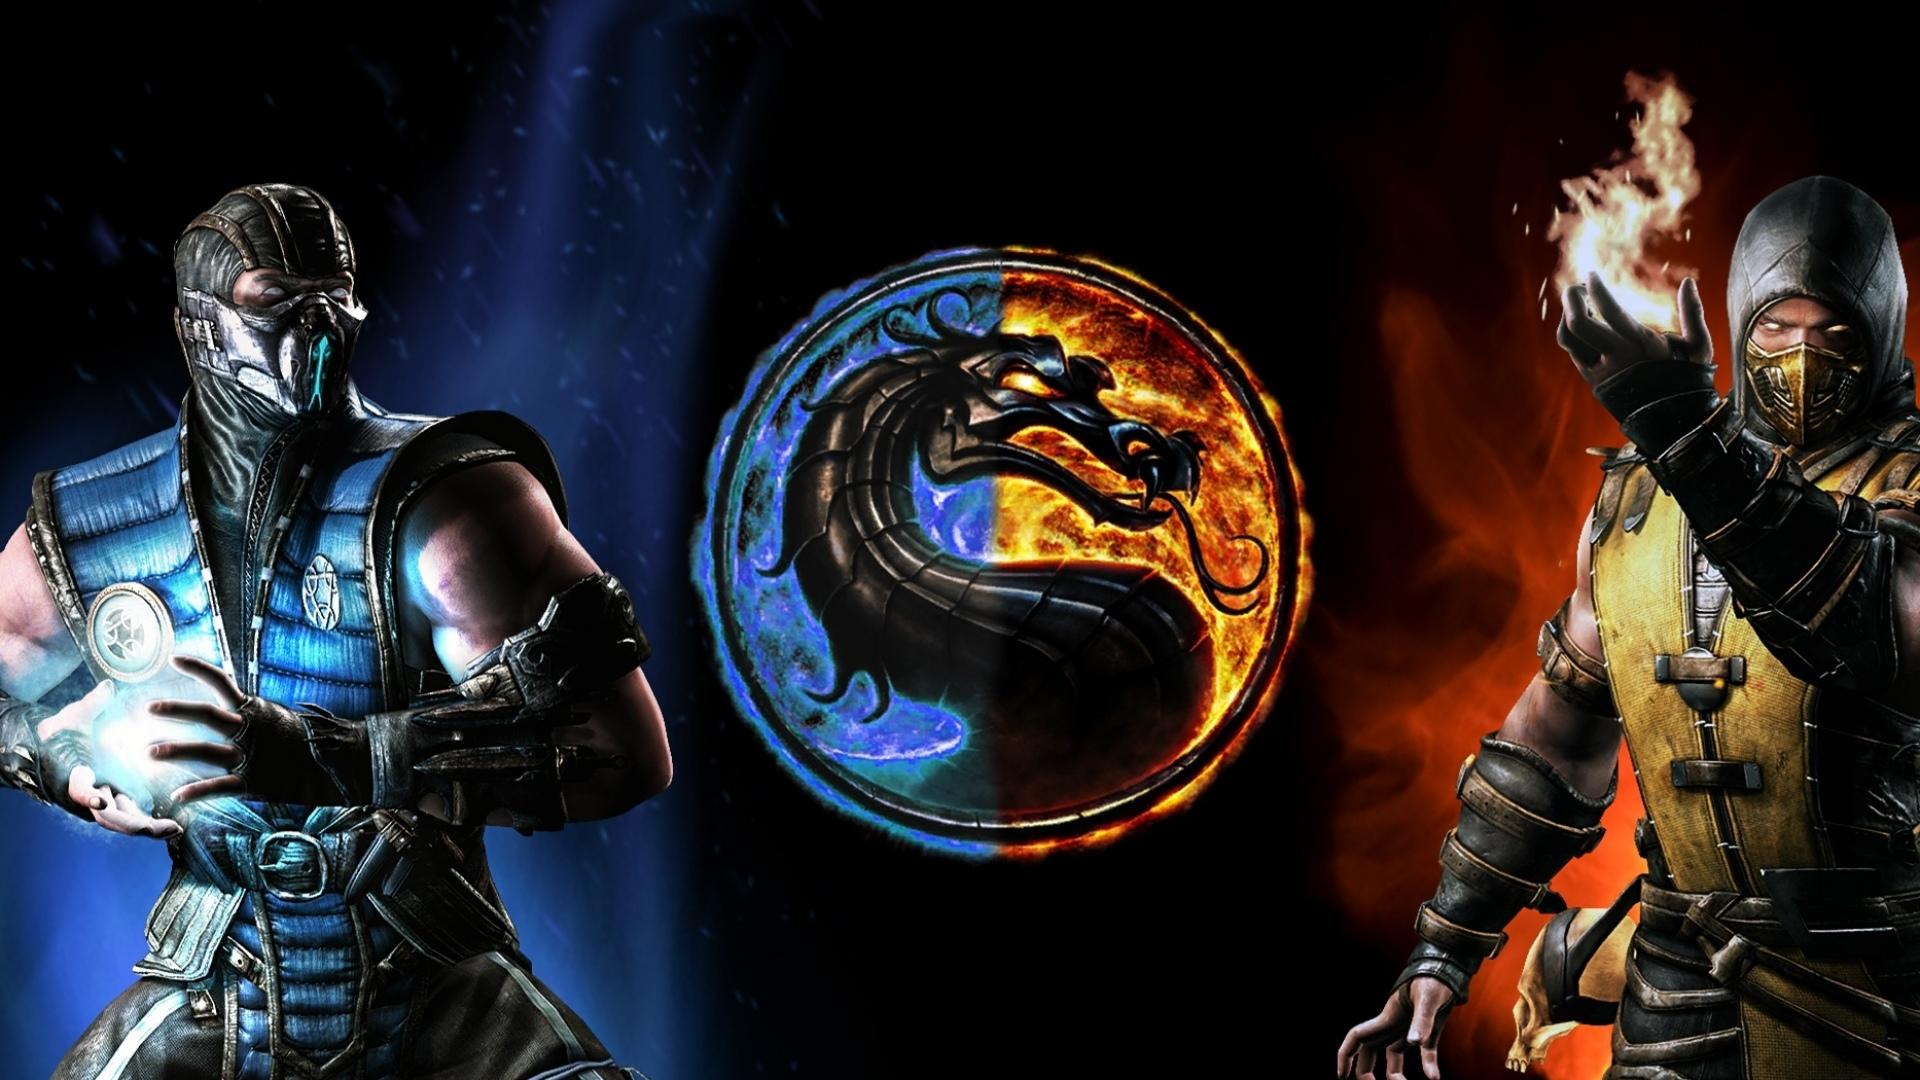 Mortal Kombat X Wallpaper Mortal Kombat Movie 2021 2165225